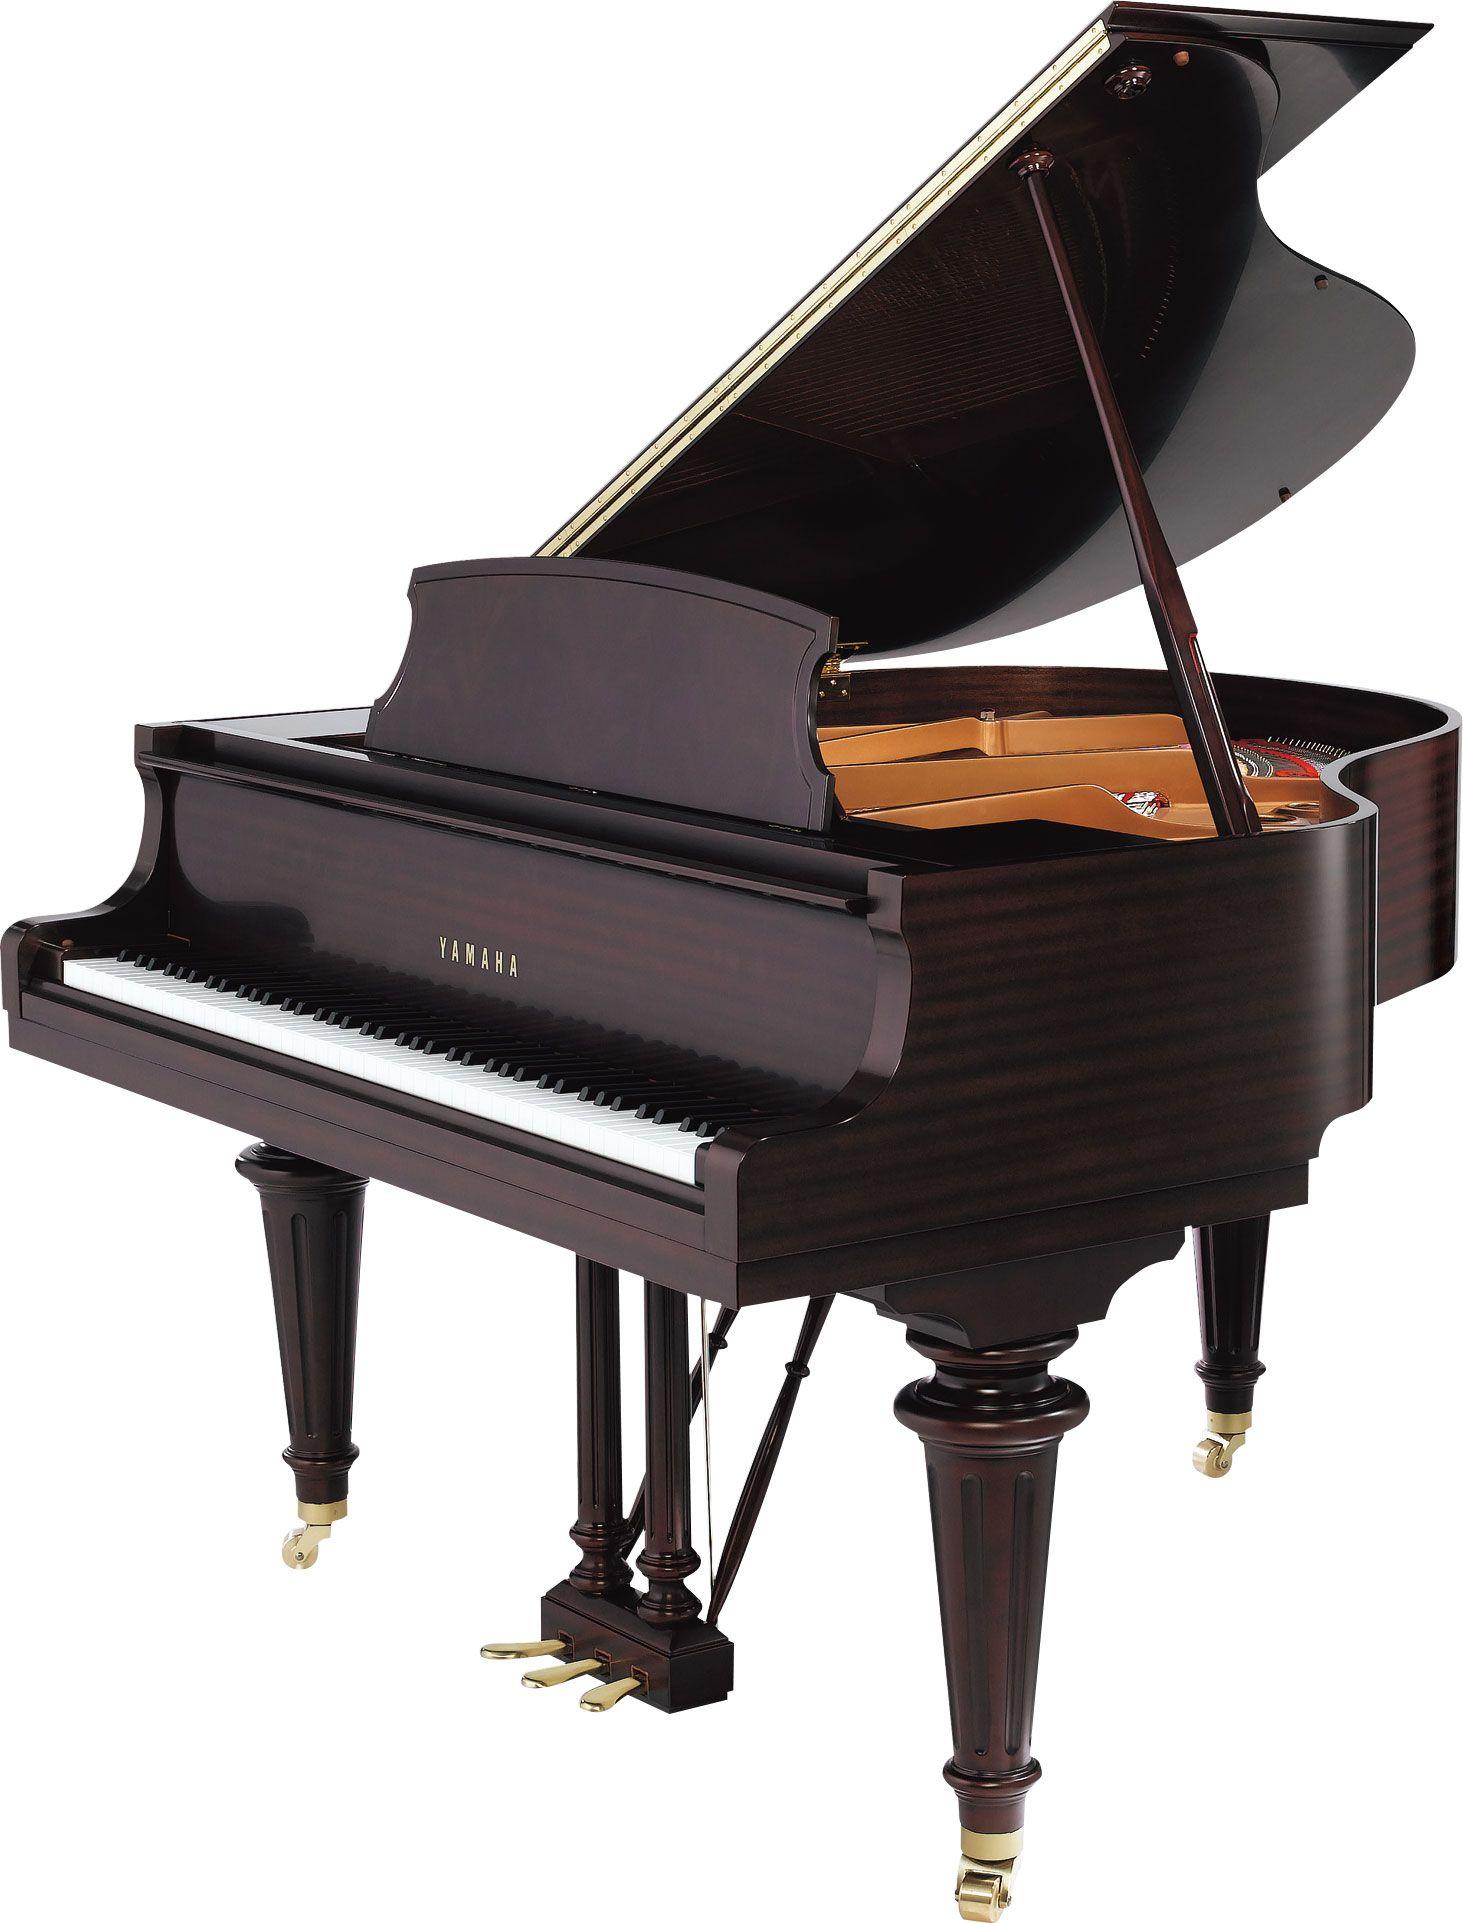 Gb1k G Series Grand Pianos Pianos Keyboards Musical Instruments Products Yamaha United States Piano Semi Acoustic Guitar Grand Piano